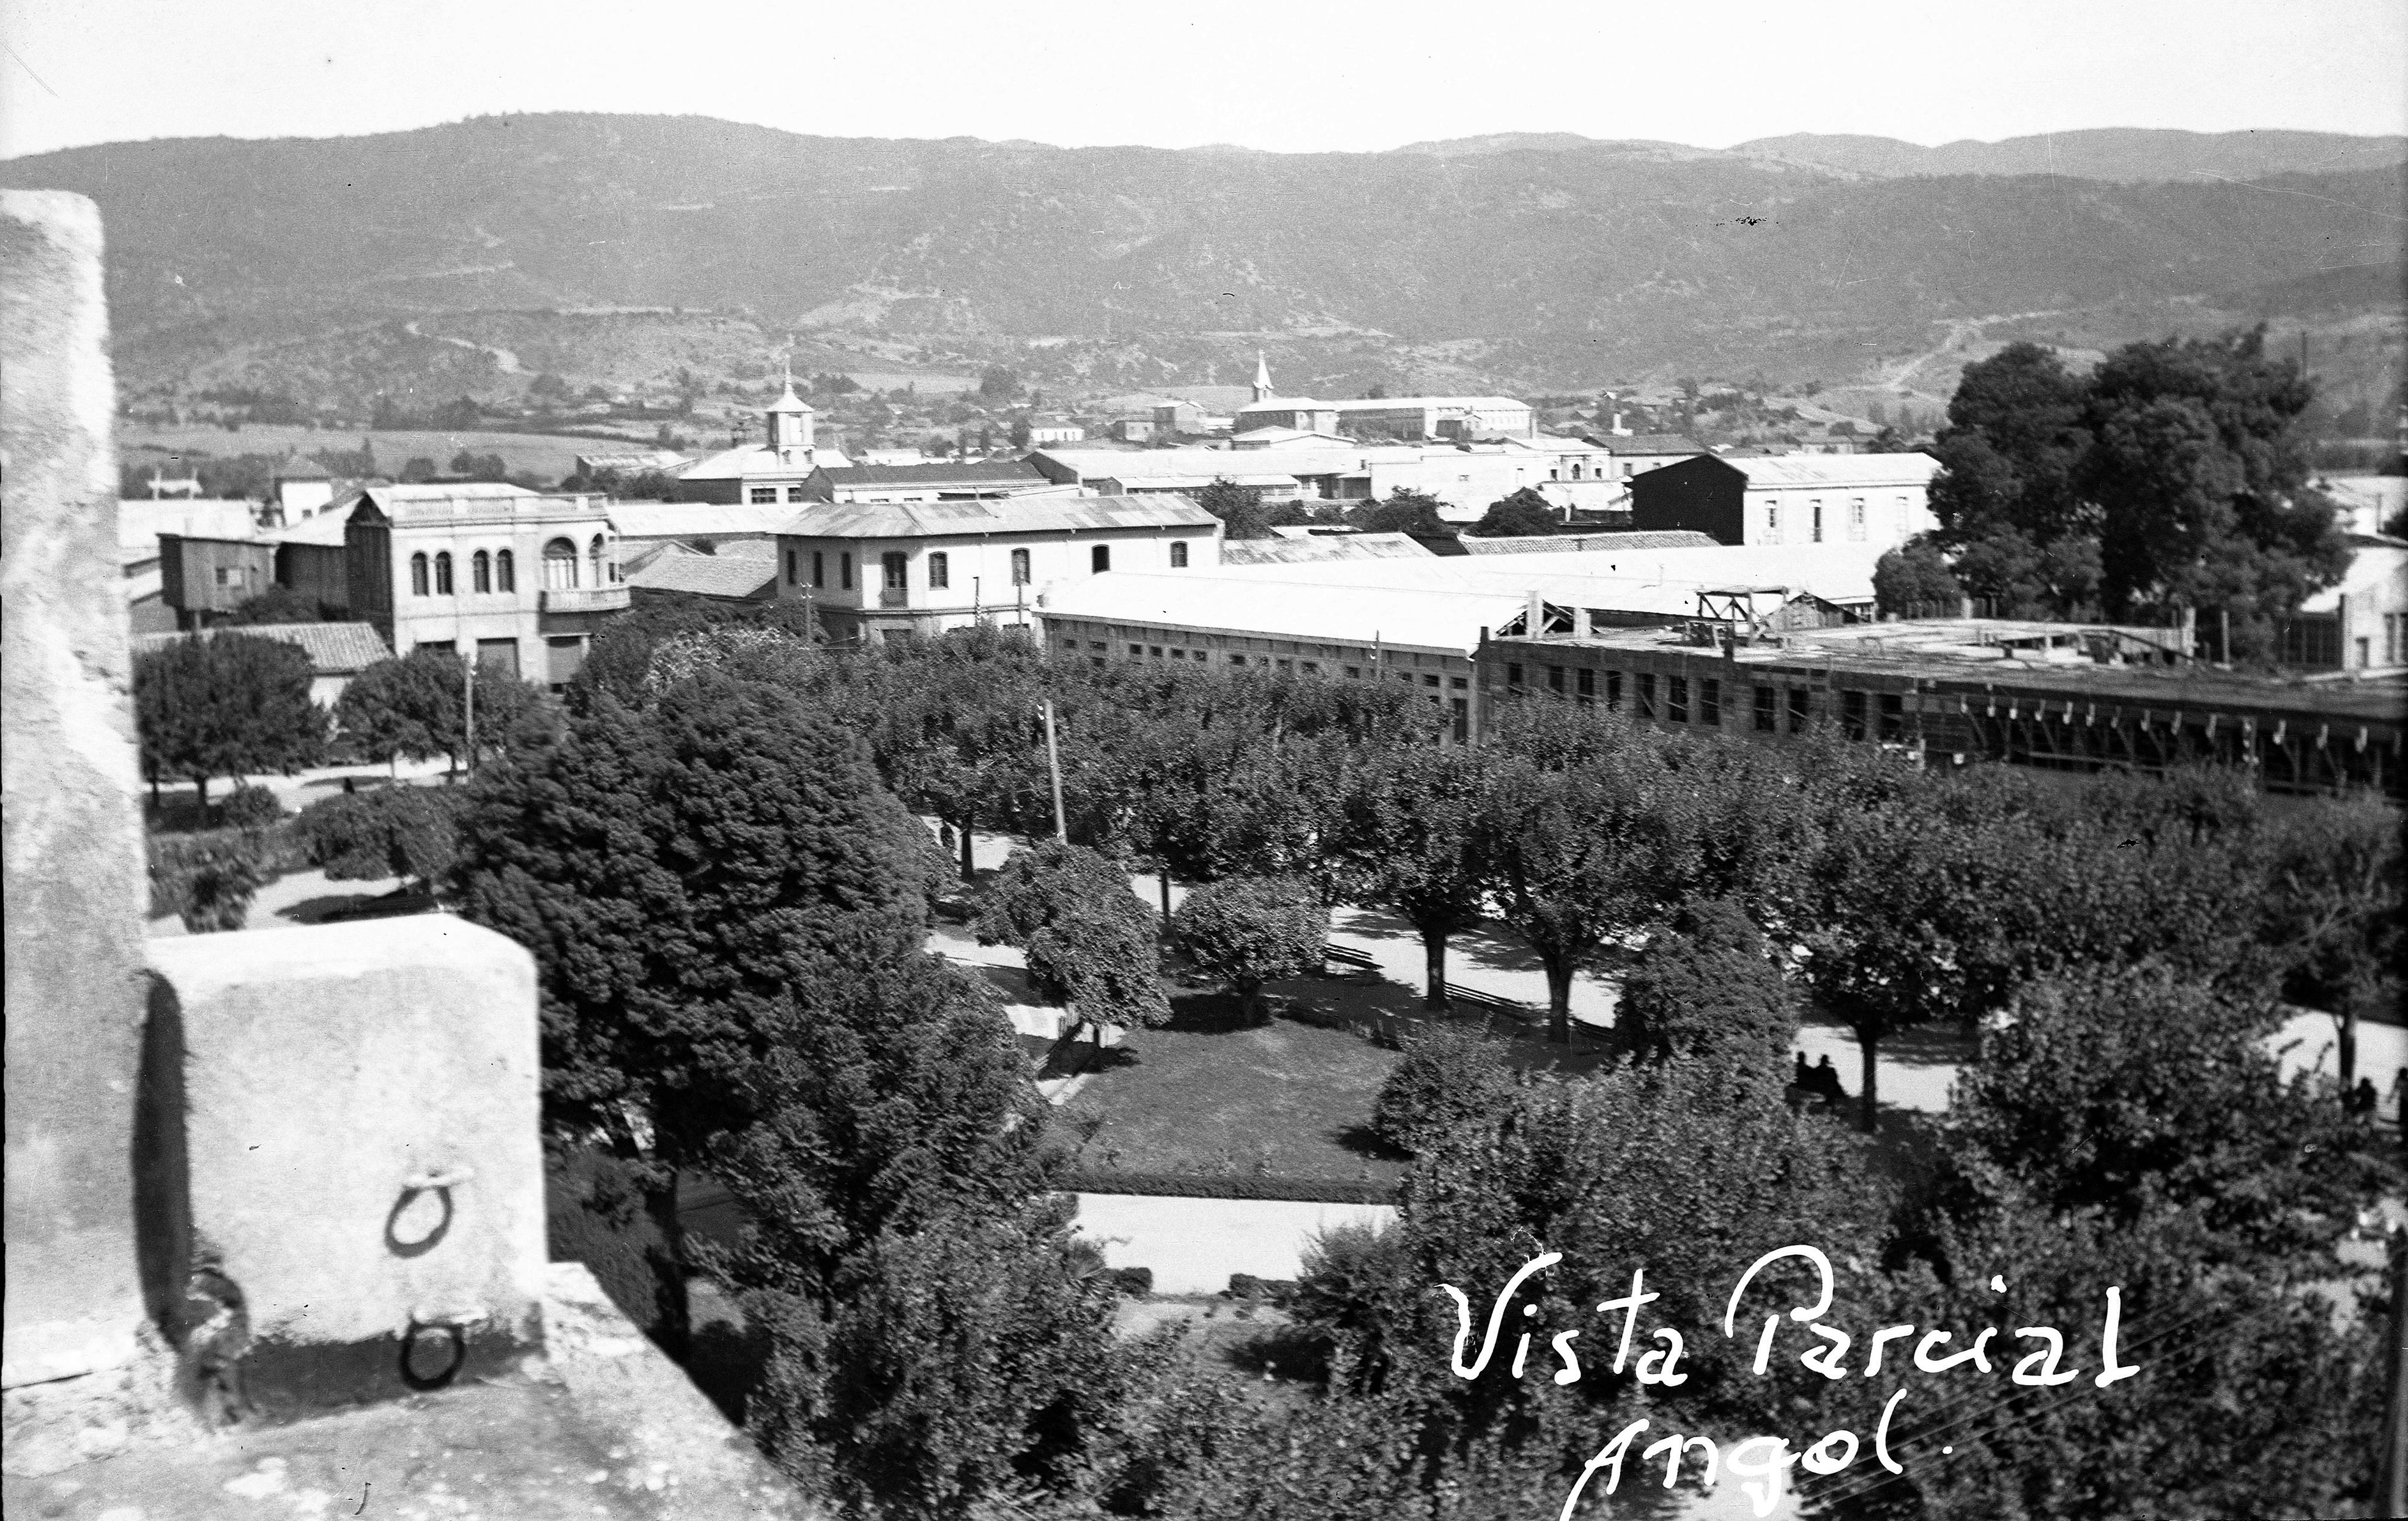 Enterreno - Fotos históricas de chile - fotos antiguas de Chile - Centro de Angol en 1952